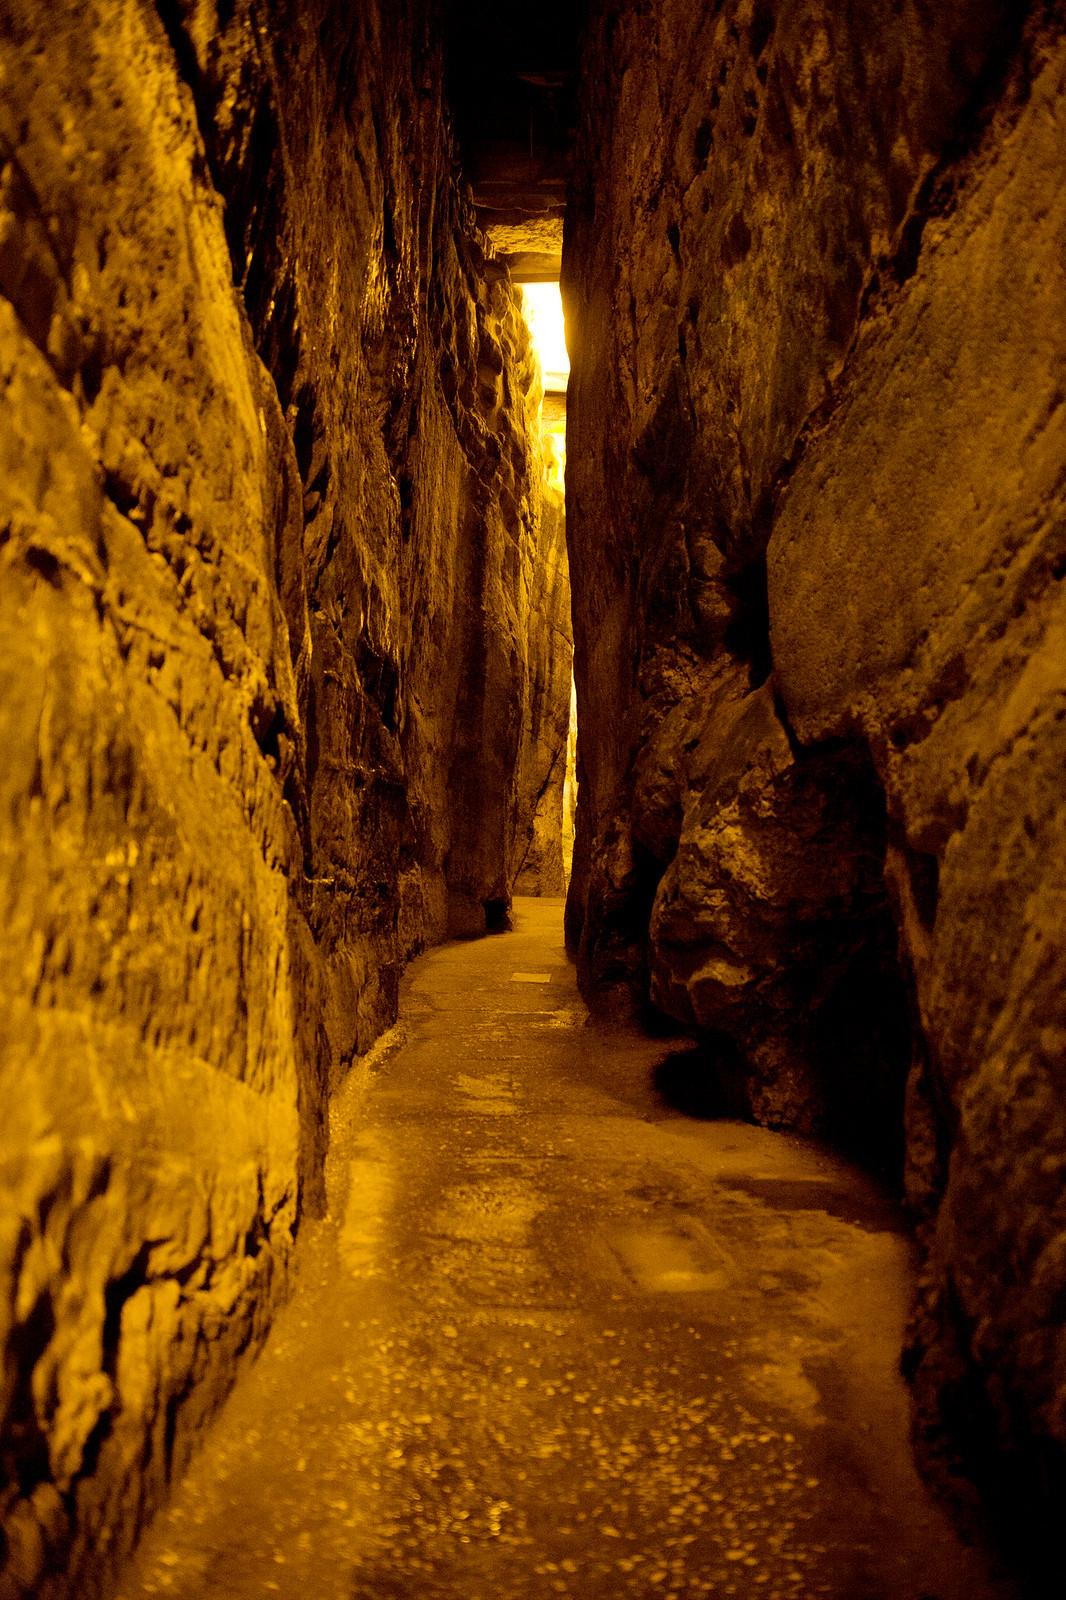 Jerusalem_Western Wall Tunnels_3_Noam Chen_IMOT